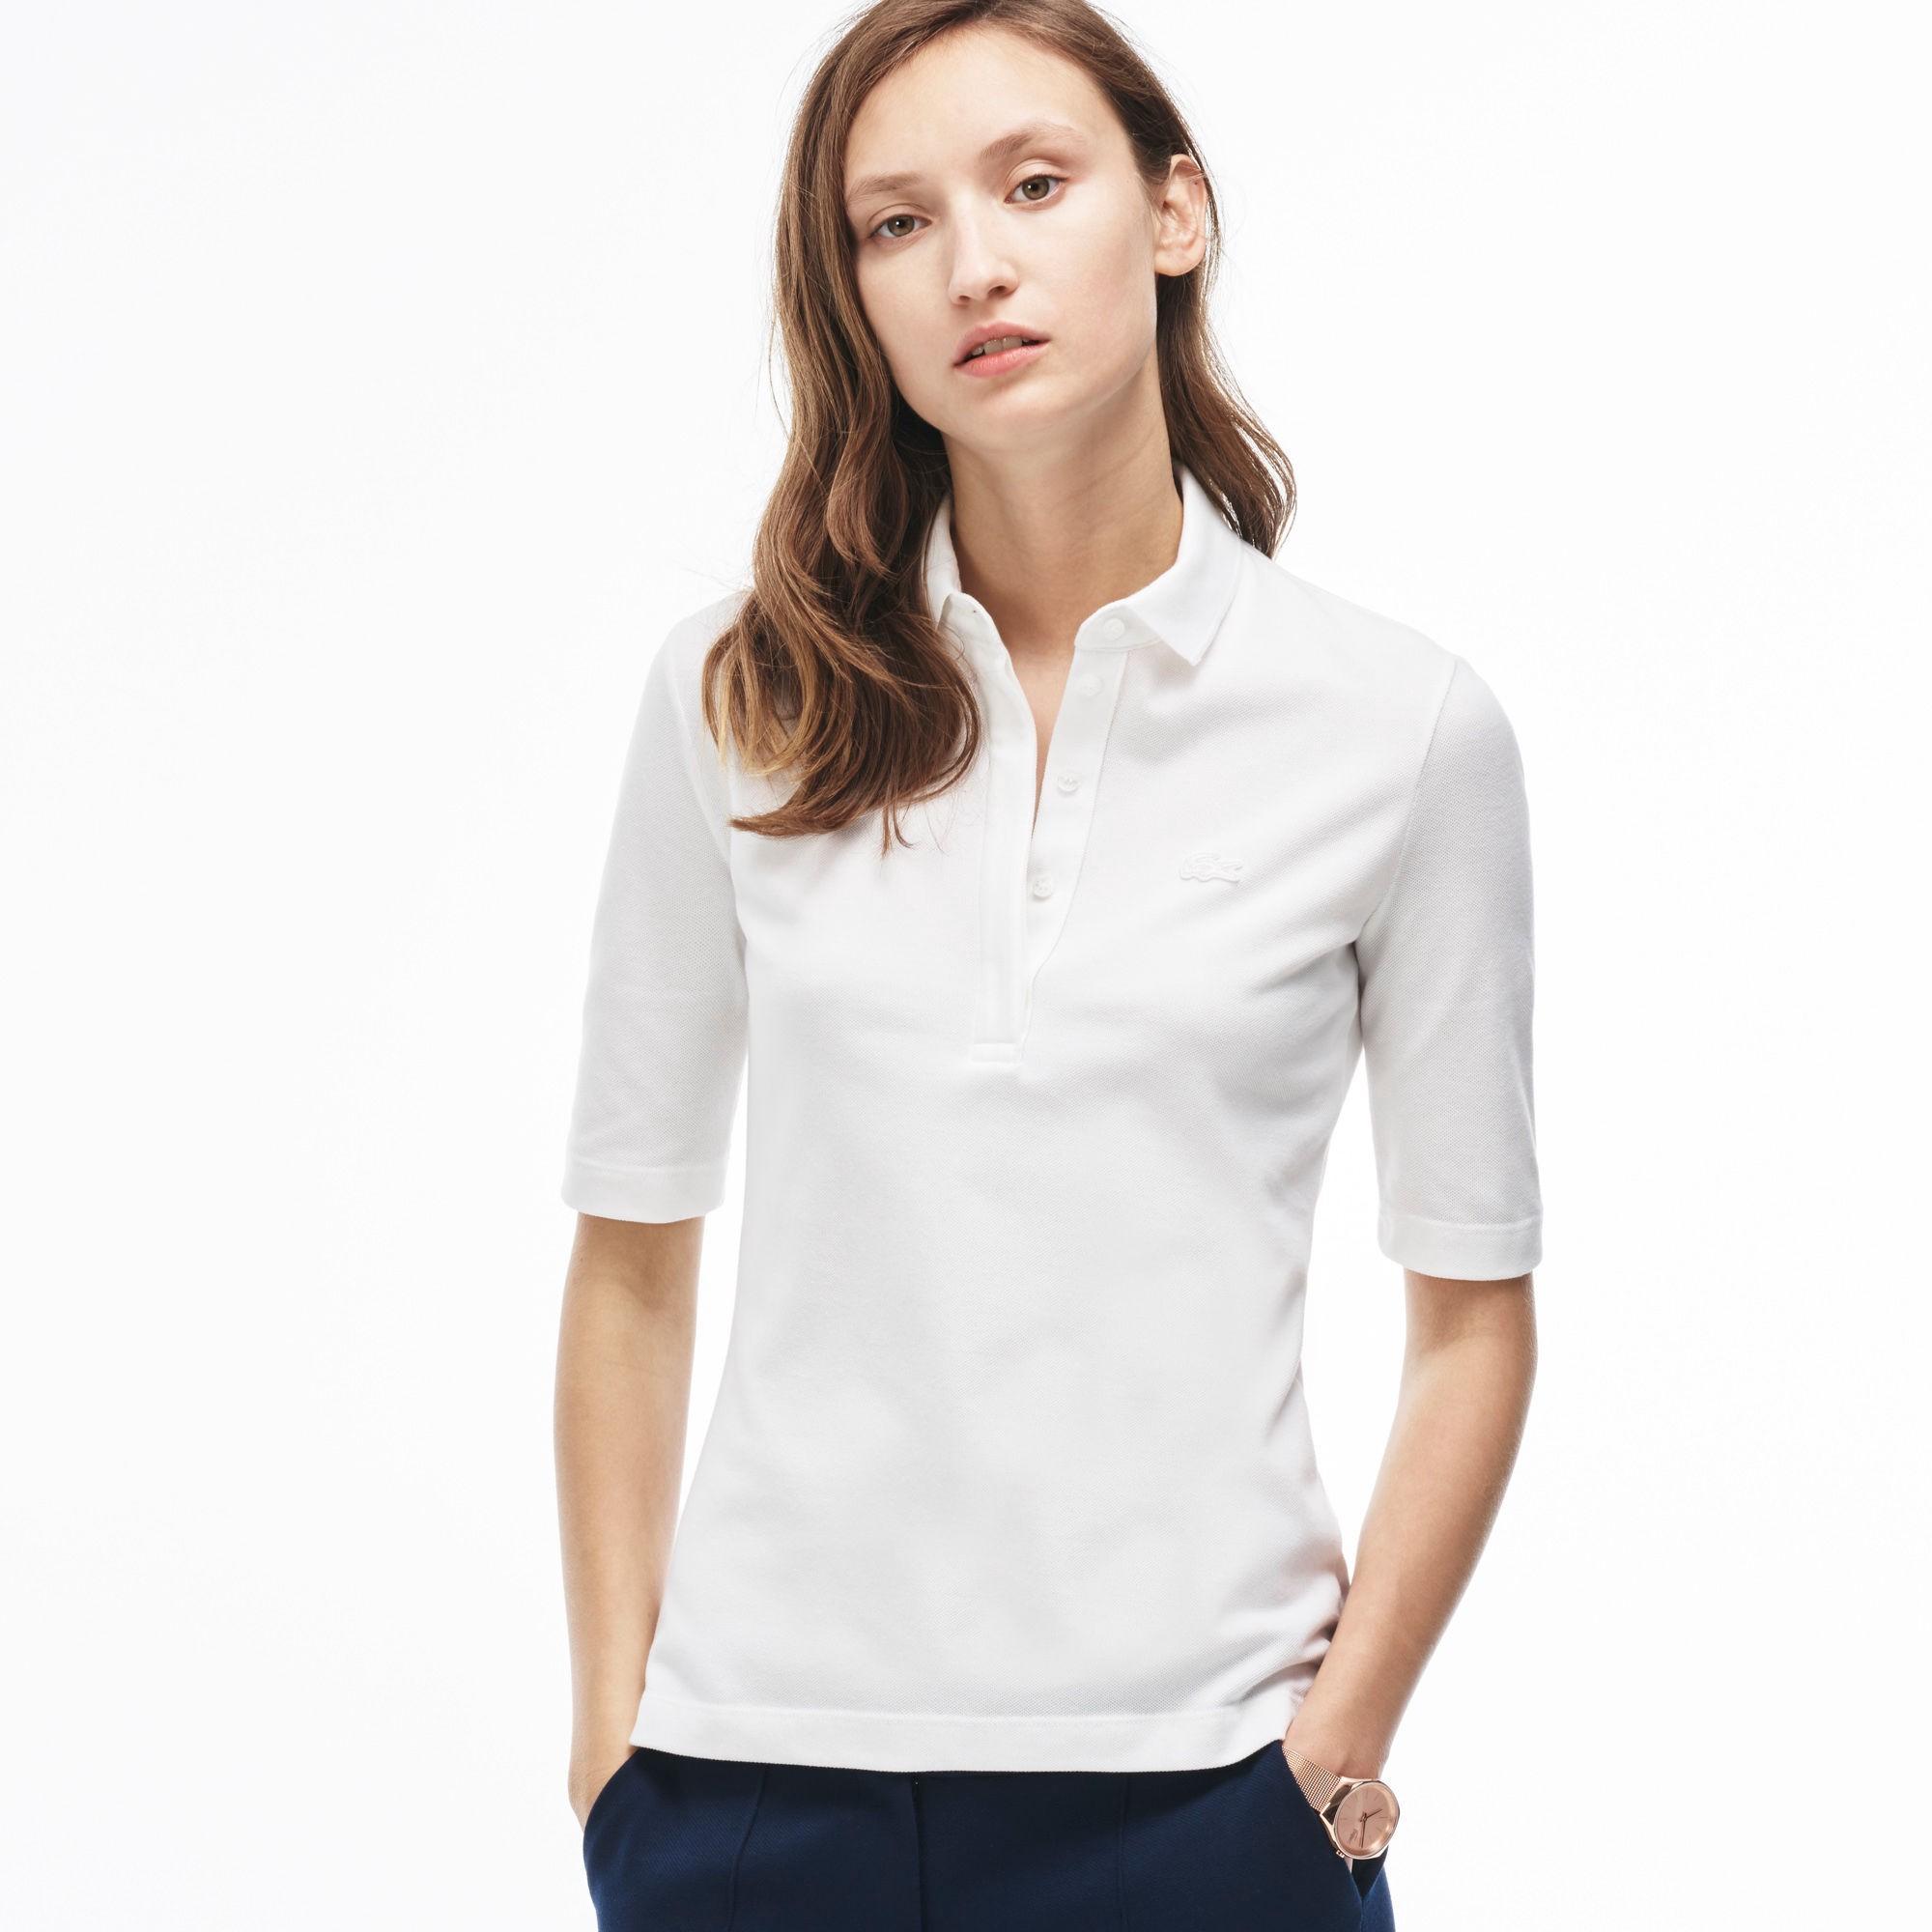 Women's Slim Fit Half Sleeve Stretch Piqué Polo Shirt - White